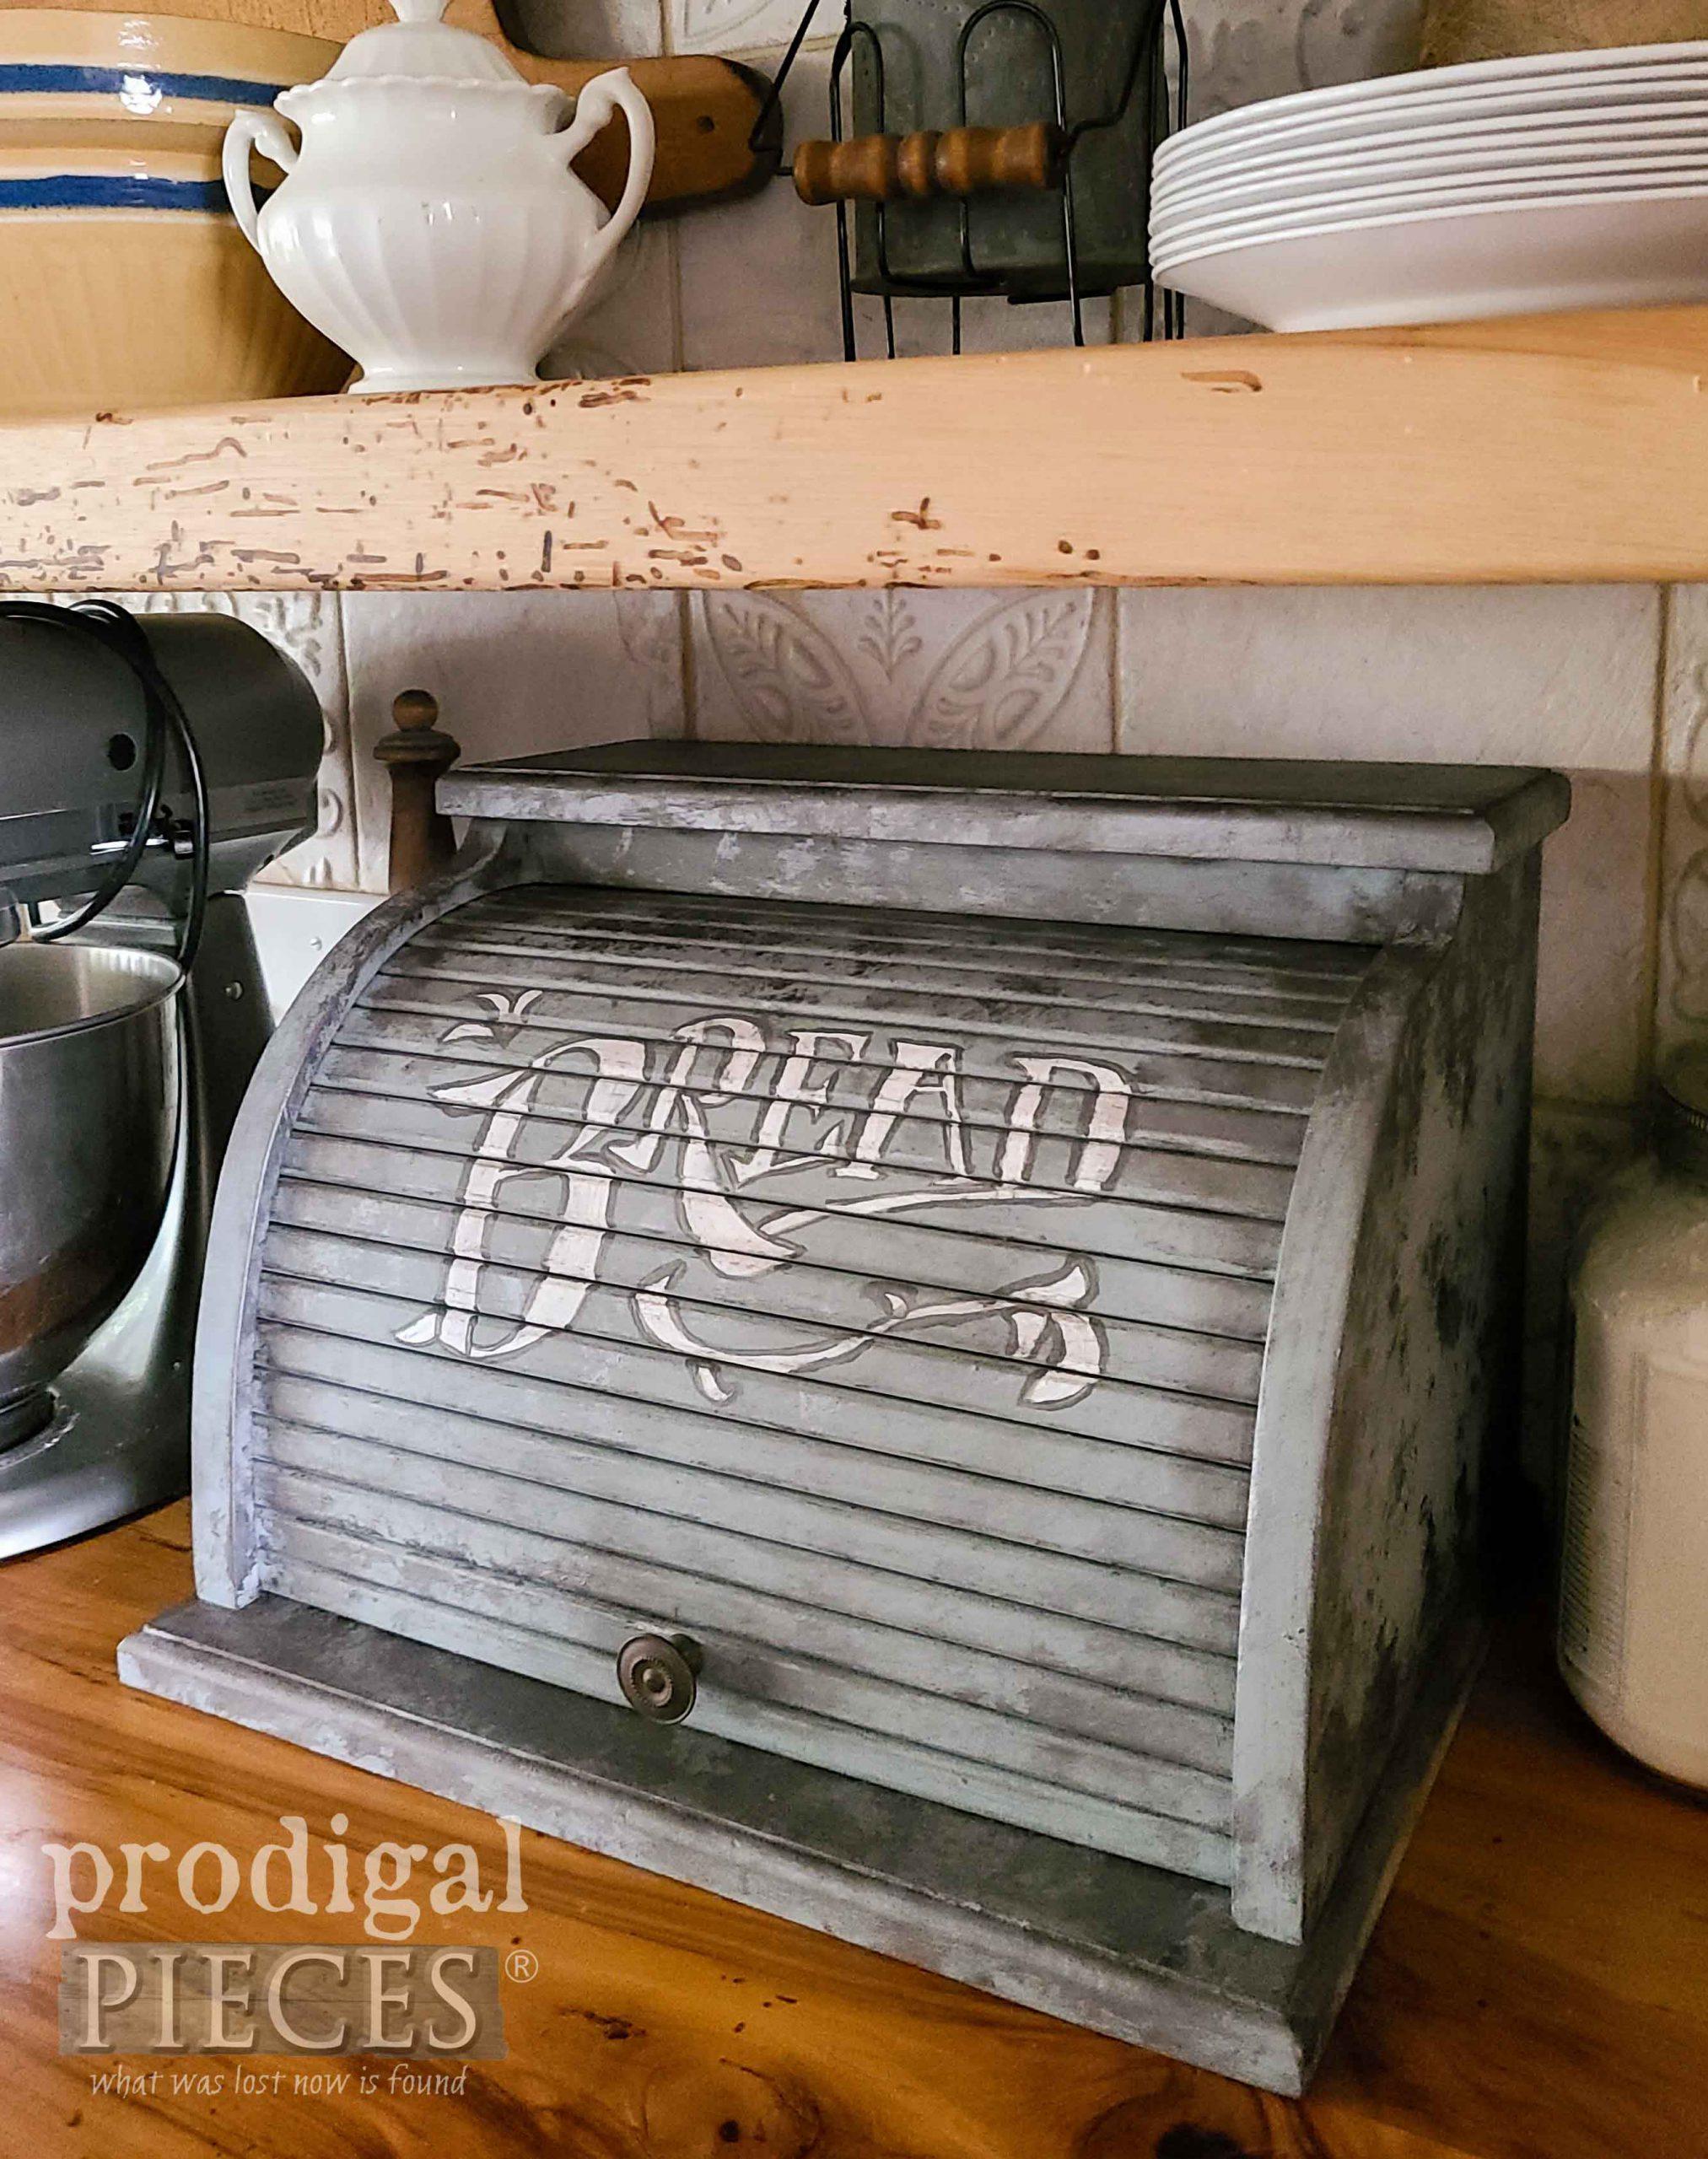 Hand-Painted Bread Box by Larissa of Prodigal Pieces | prodigalpieces.com #prodigalpieces #home #homedecor #farmhouse #diy